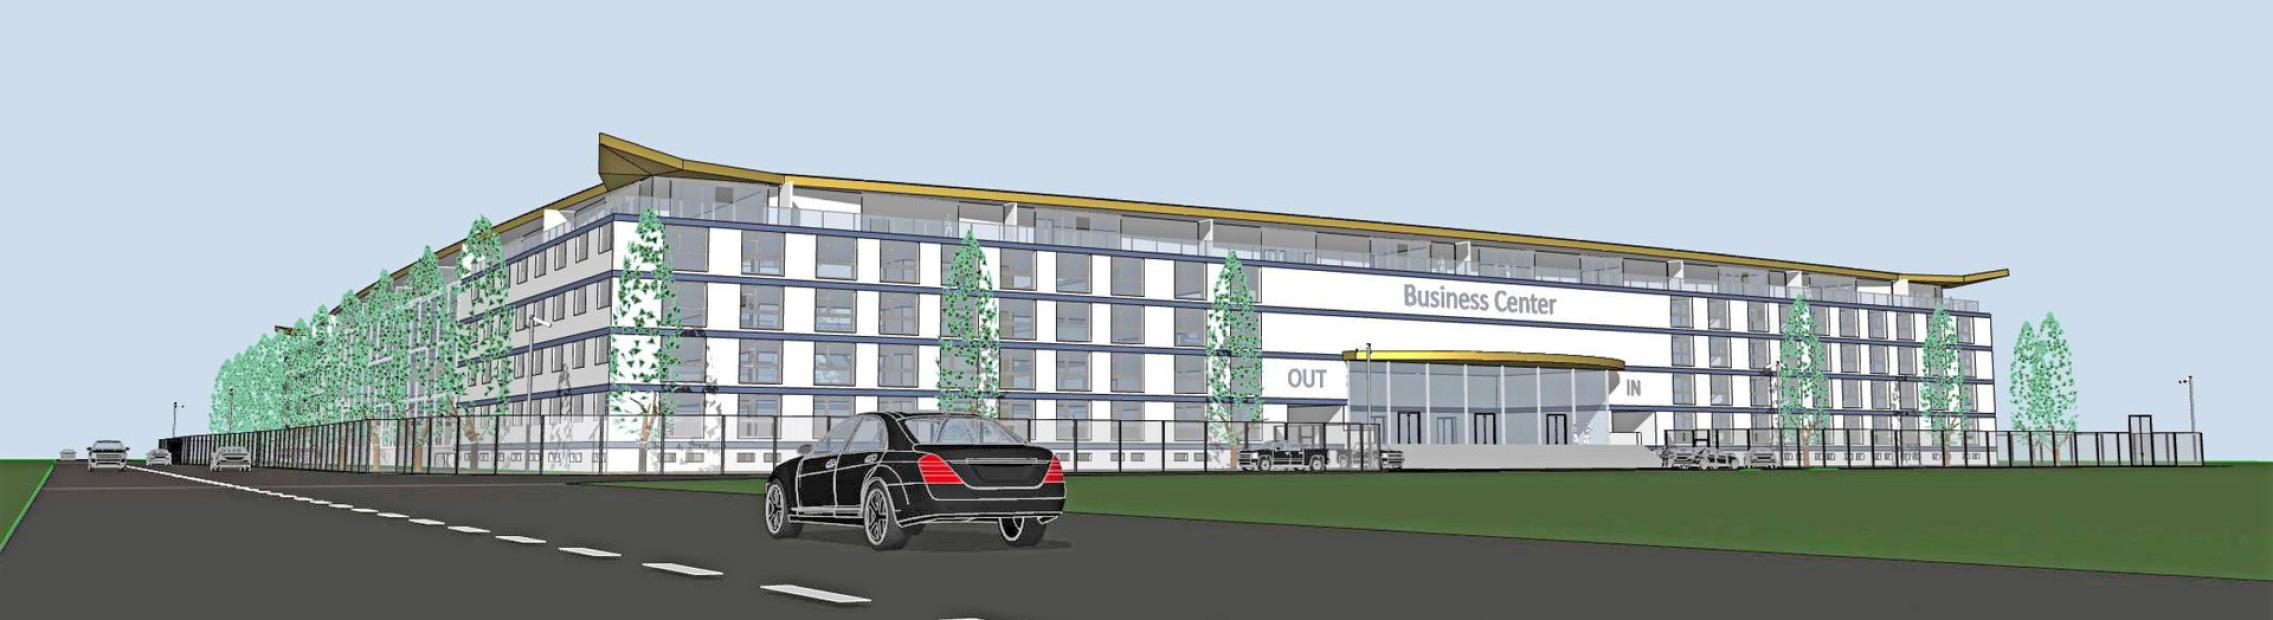 For Sale - 50 % of Pharma Business Center in Switzerland on motorway 2 - Architect Volker Goebel - Bauland Gewerbezone Arbeitszone